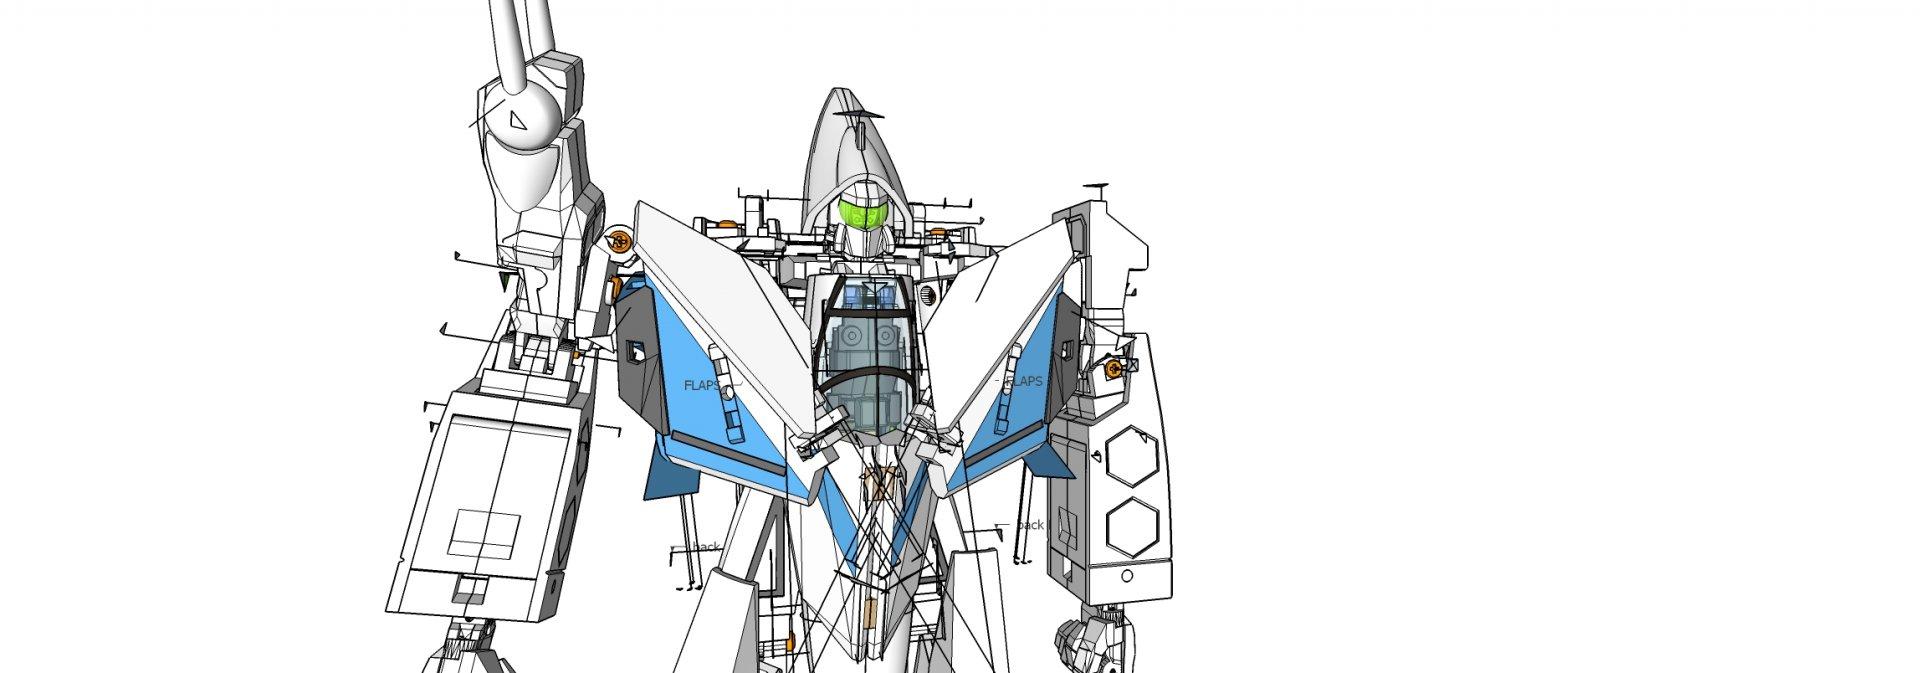 08_04MBIS03 _wingssolution TEST 3.jpg